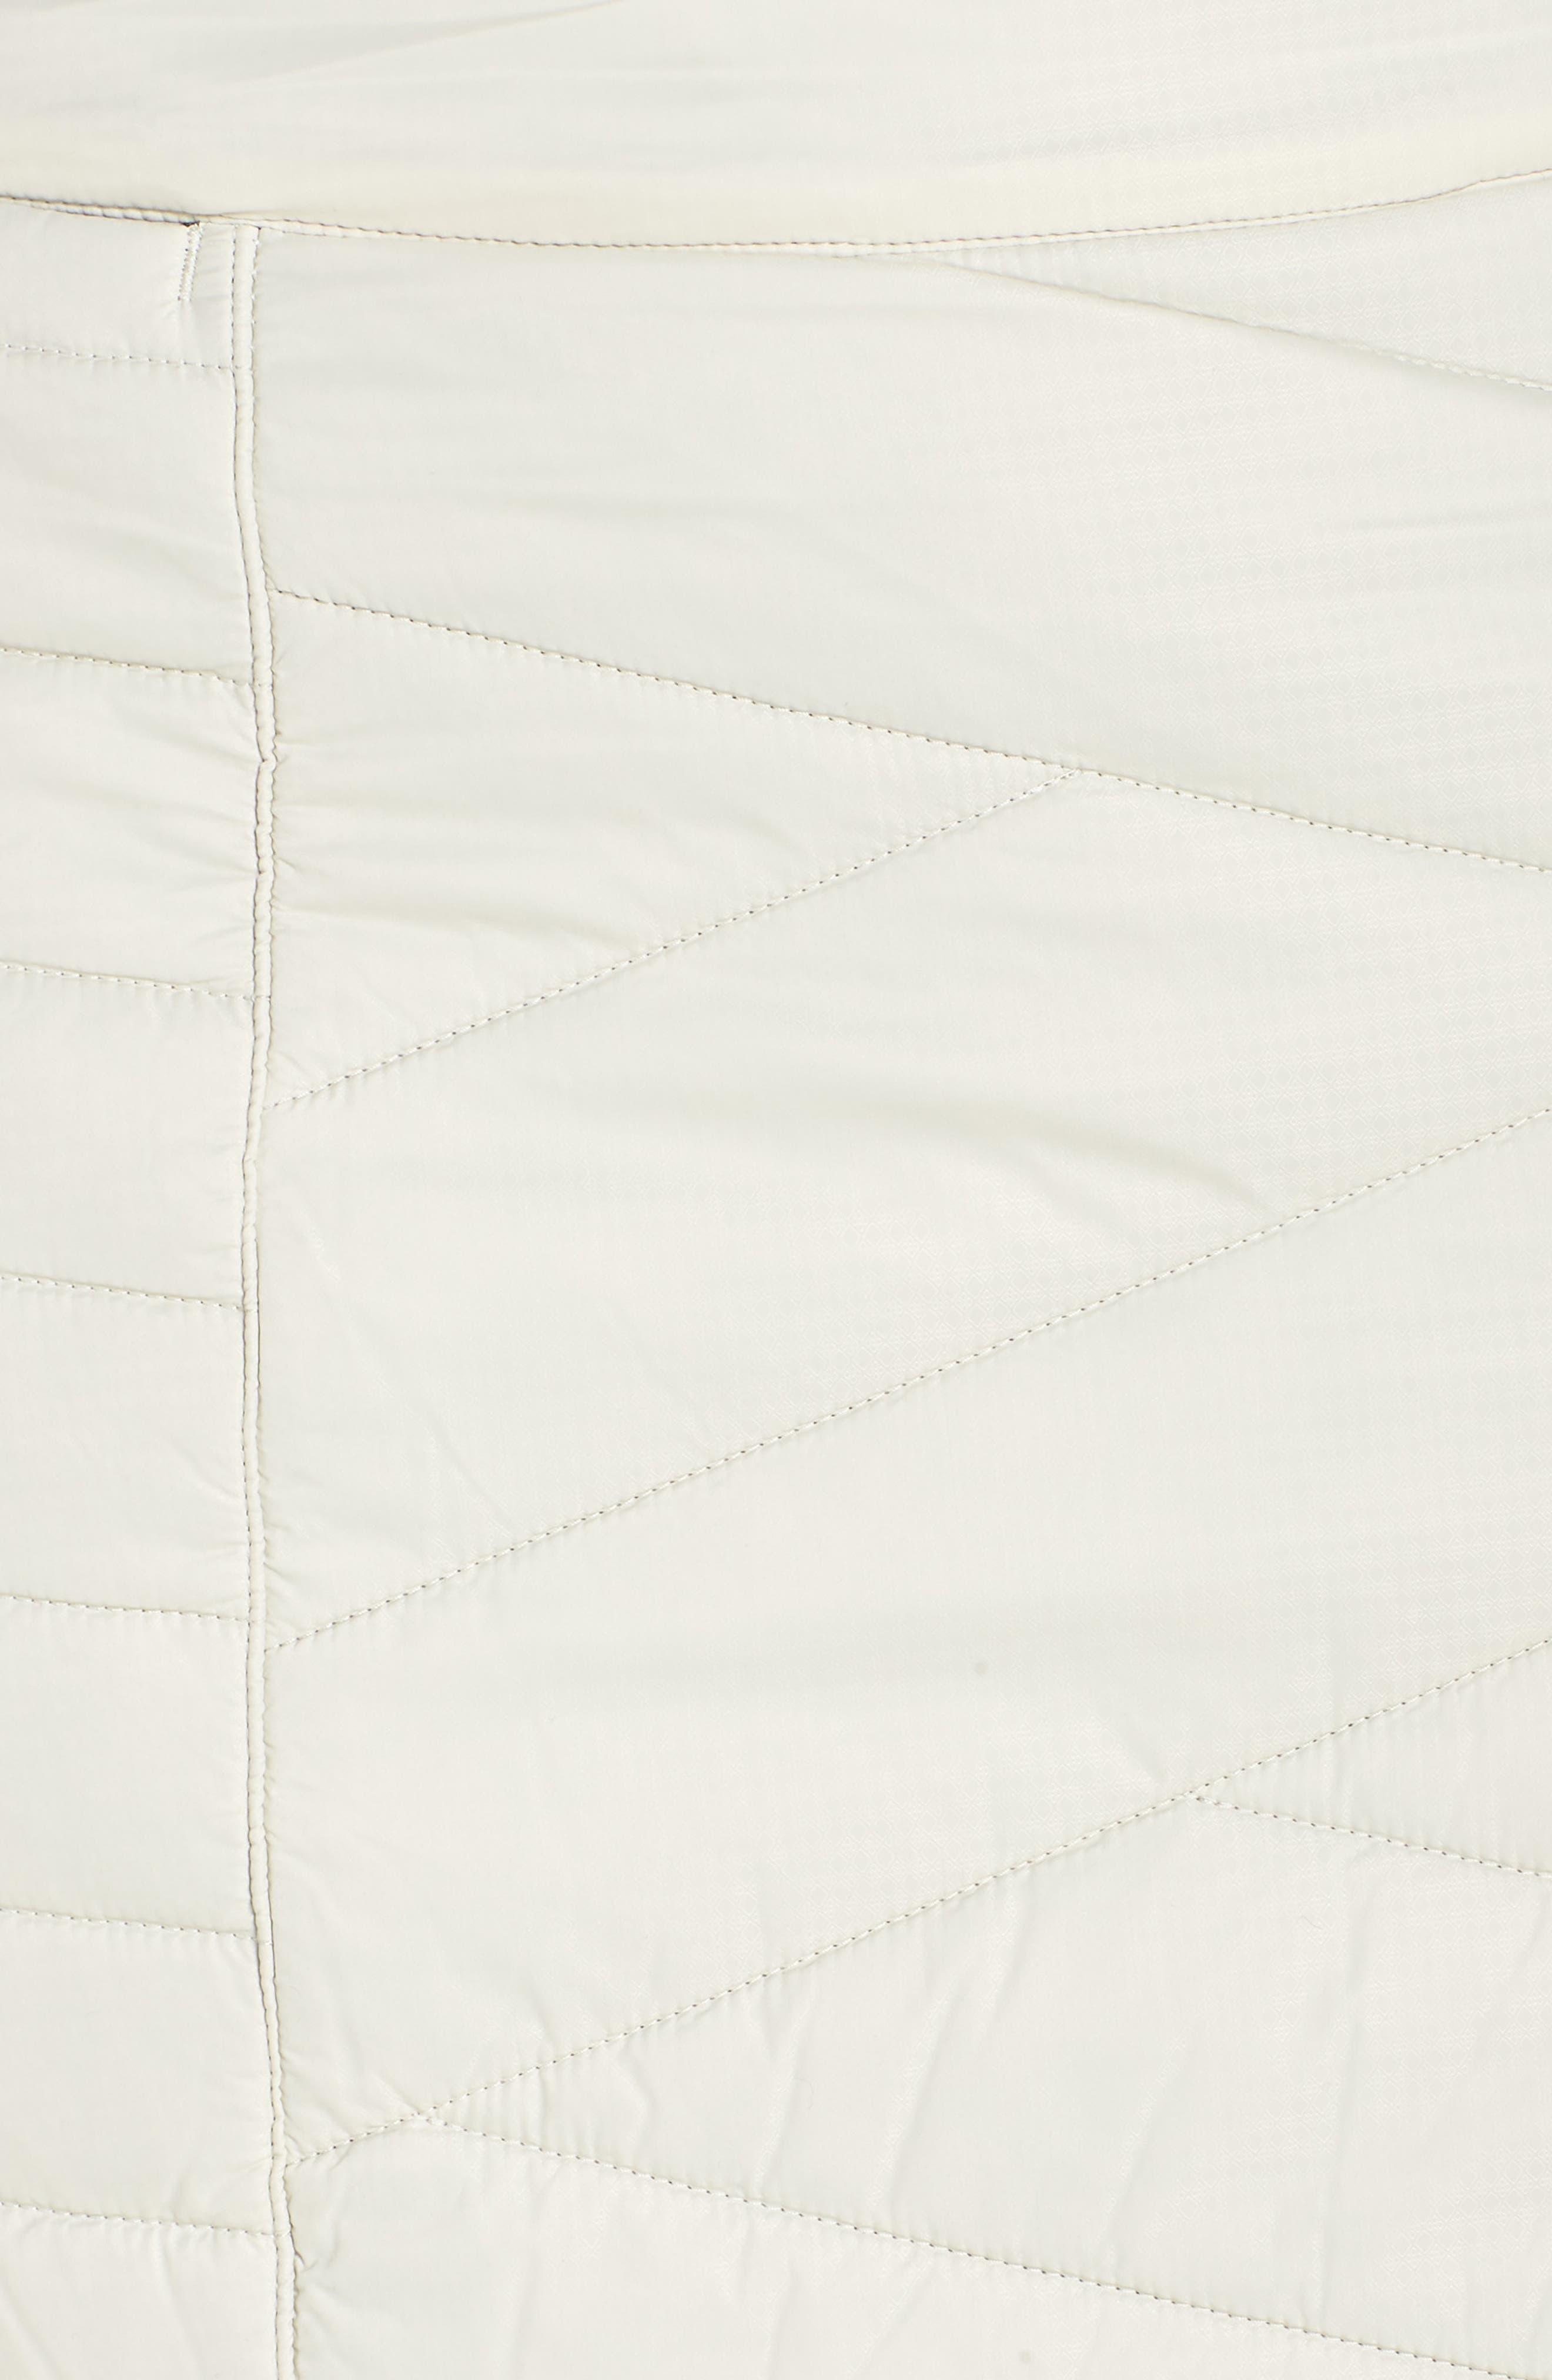 SMARTWOOL,                             Smartloft 120 Quilted Skirt,                             Alternate thumbnail 4, color,                             025